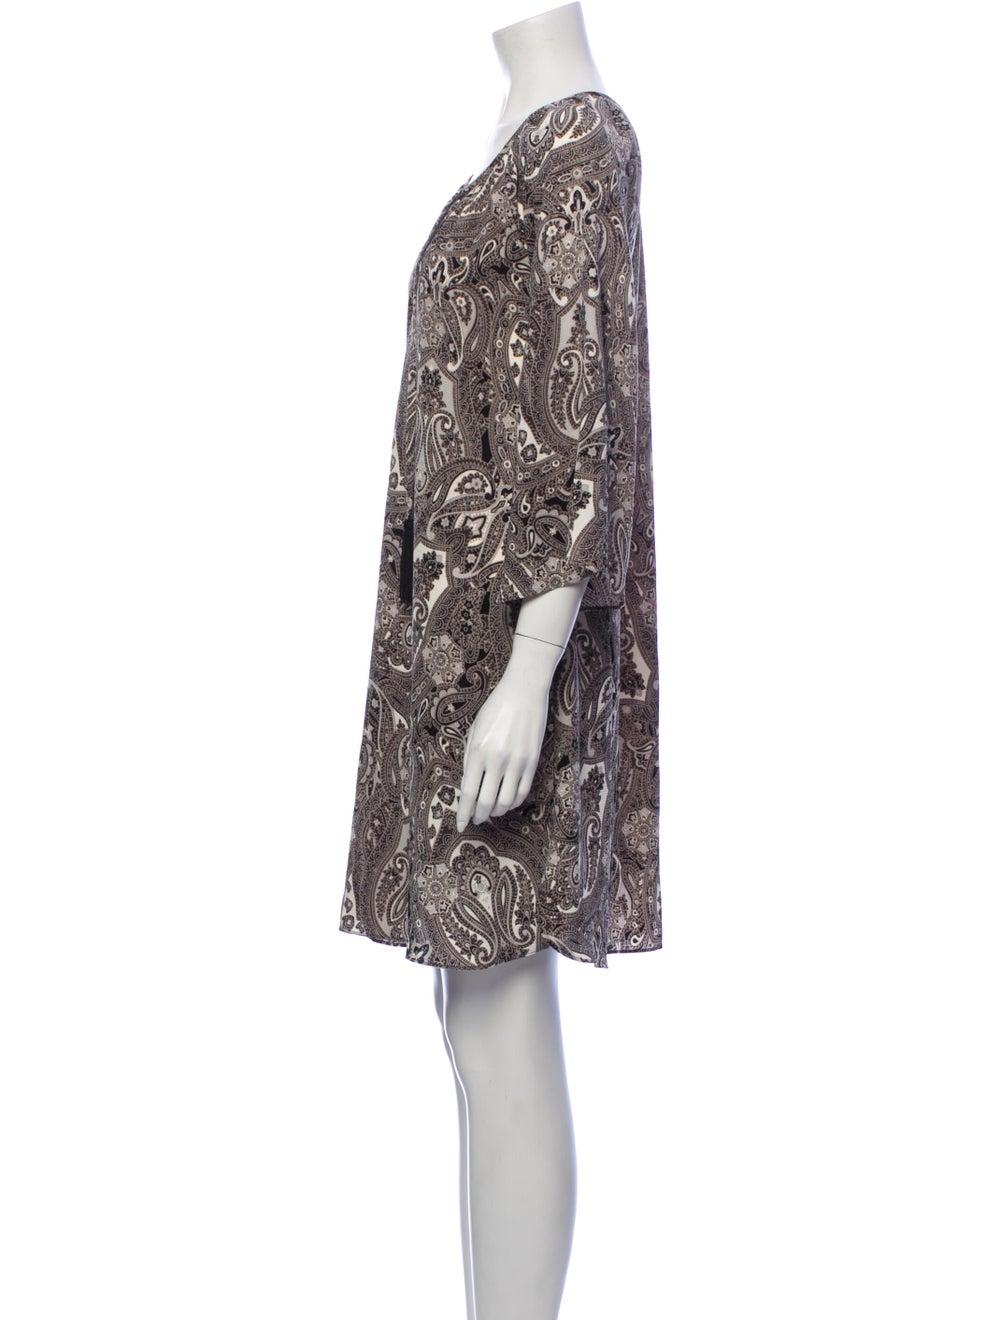 Rachel Zoe Paisley Print Mini Dress Grey - image 2